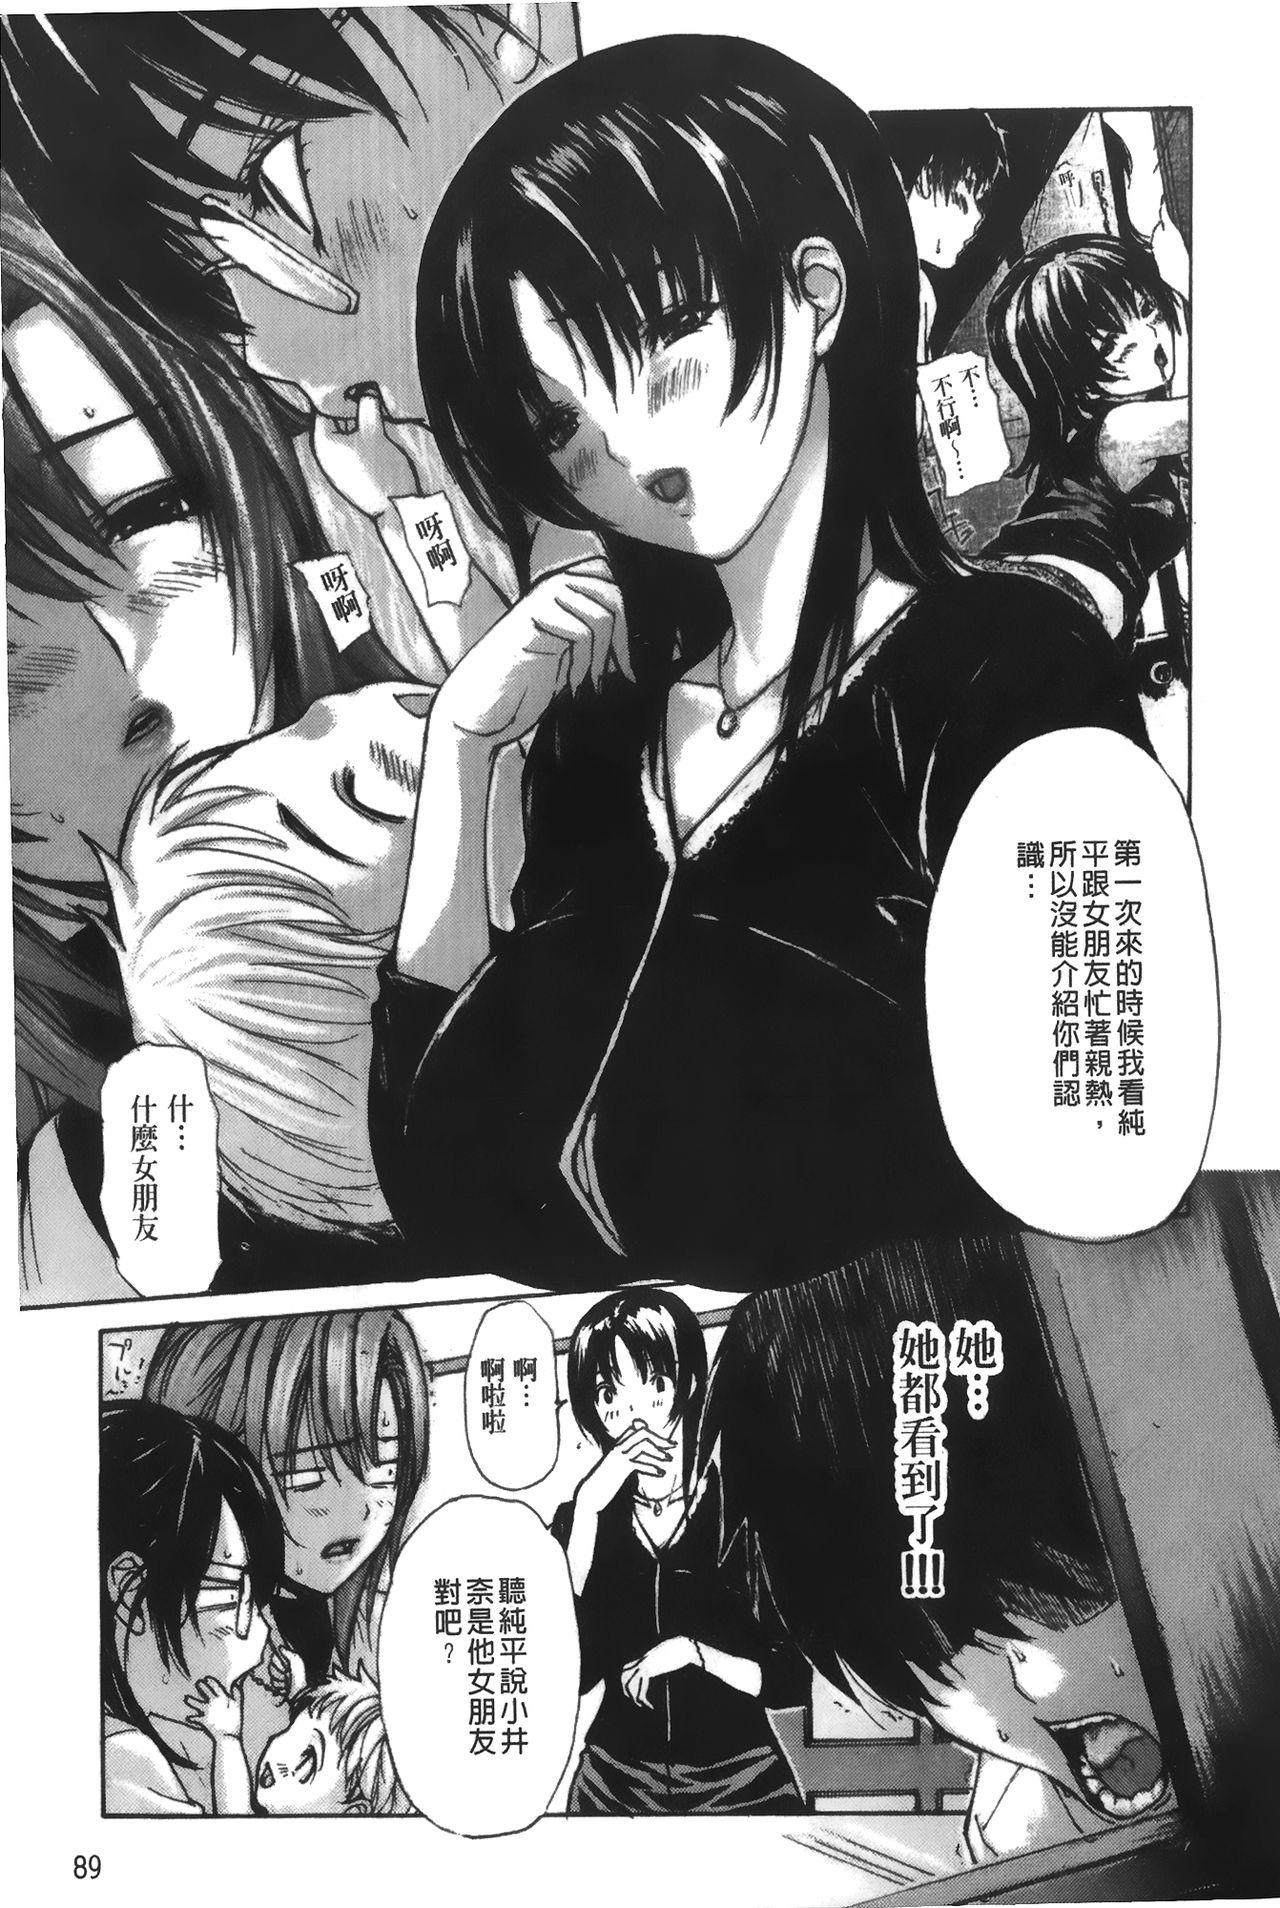 Tonari no Minano Sensei 4 | 隔壁的美奈乃老師 4 90